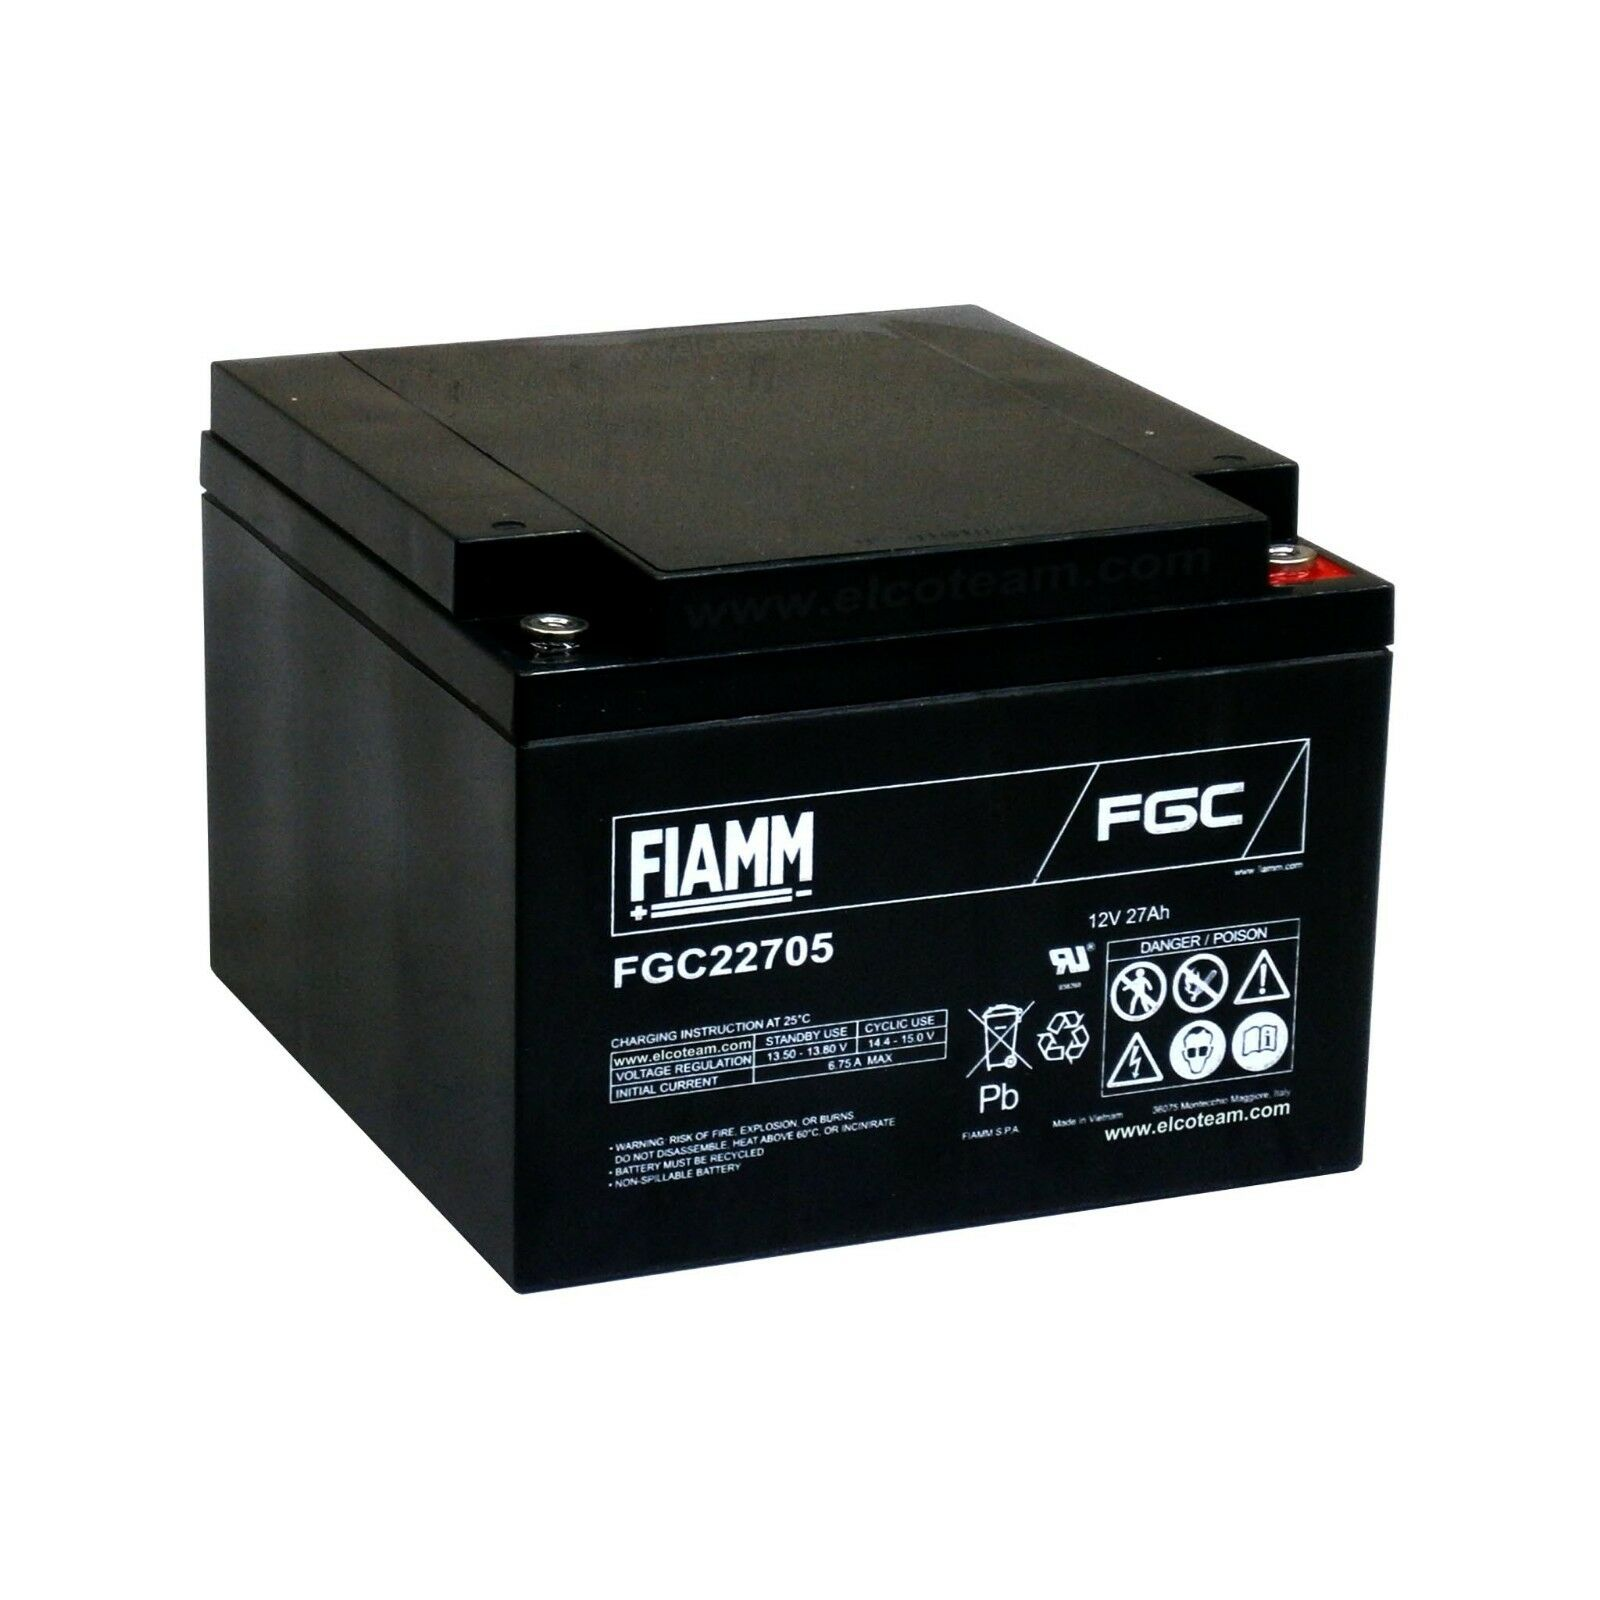 Fiamm Fgc22705 Batterie Zyklische Al Blei 12v 27ah X Fahrrad